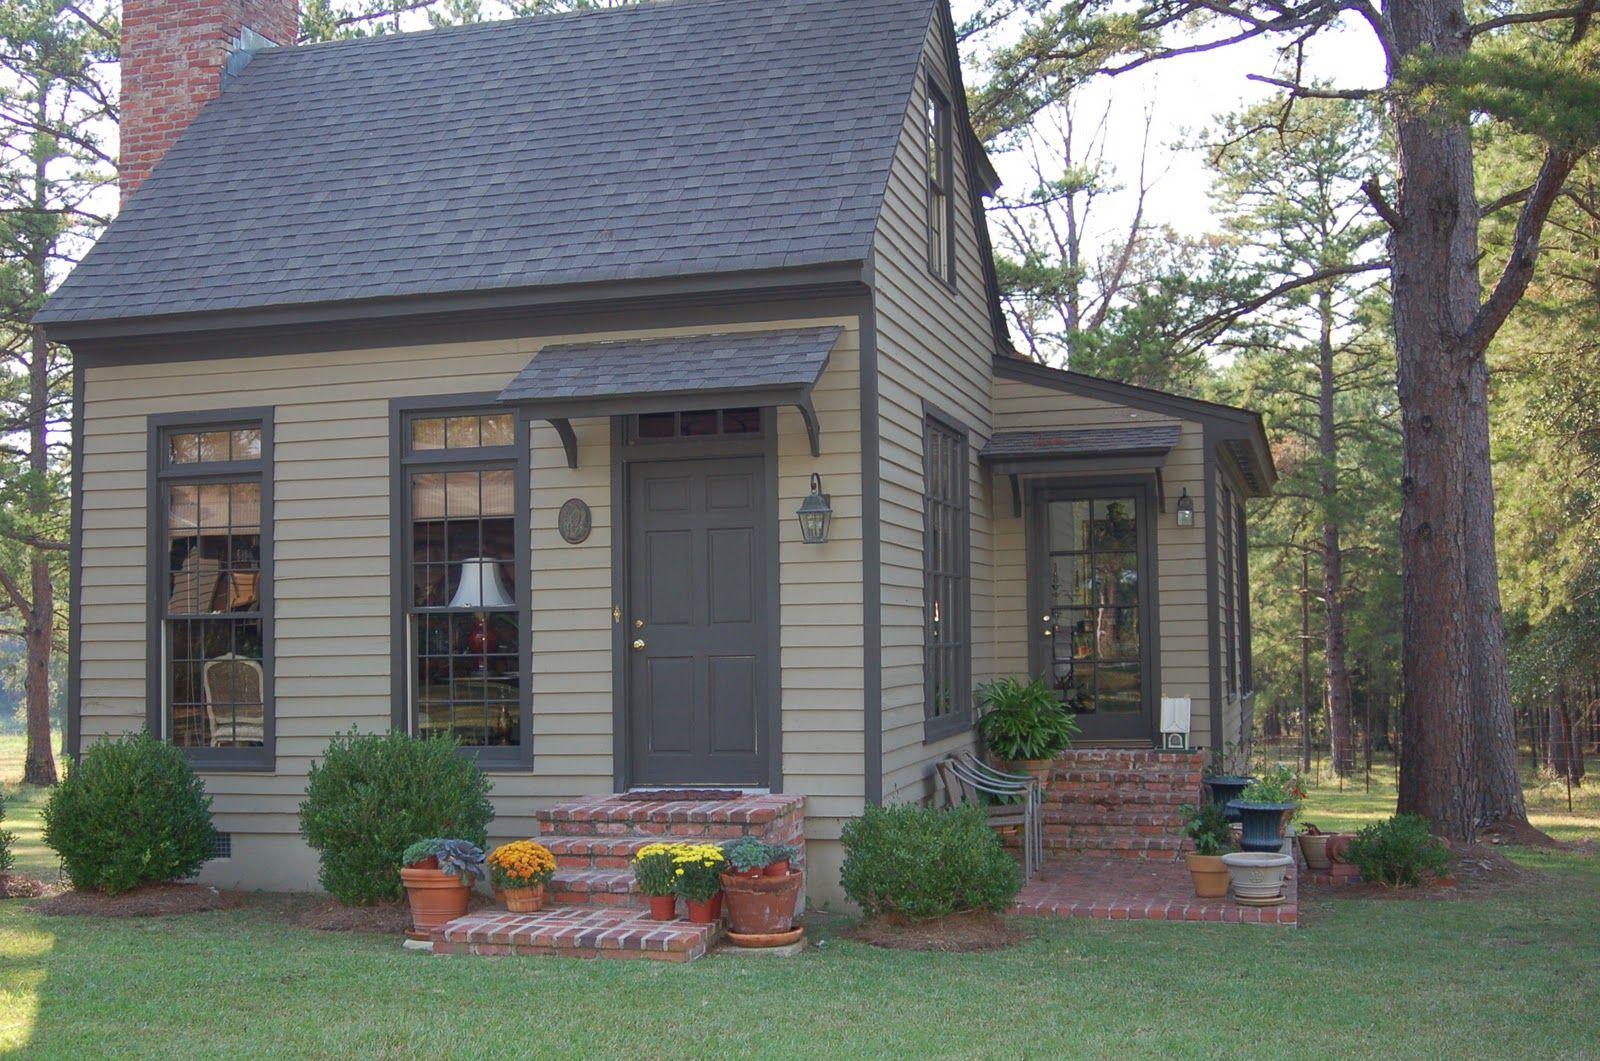 small backyard guest house plans photo gallery backyard rh pinterest com Back Yard Guest Cabins Back Yard Cottage Floor Plans